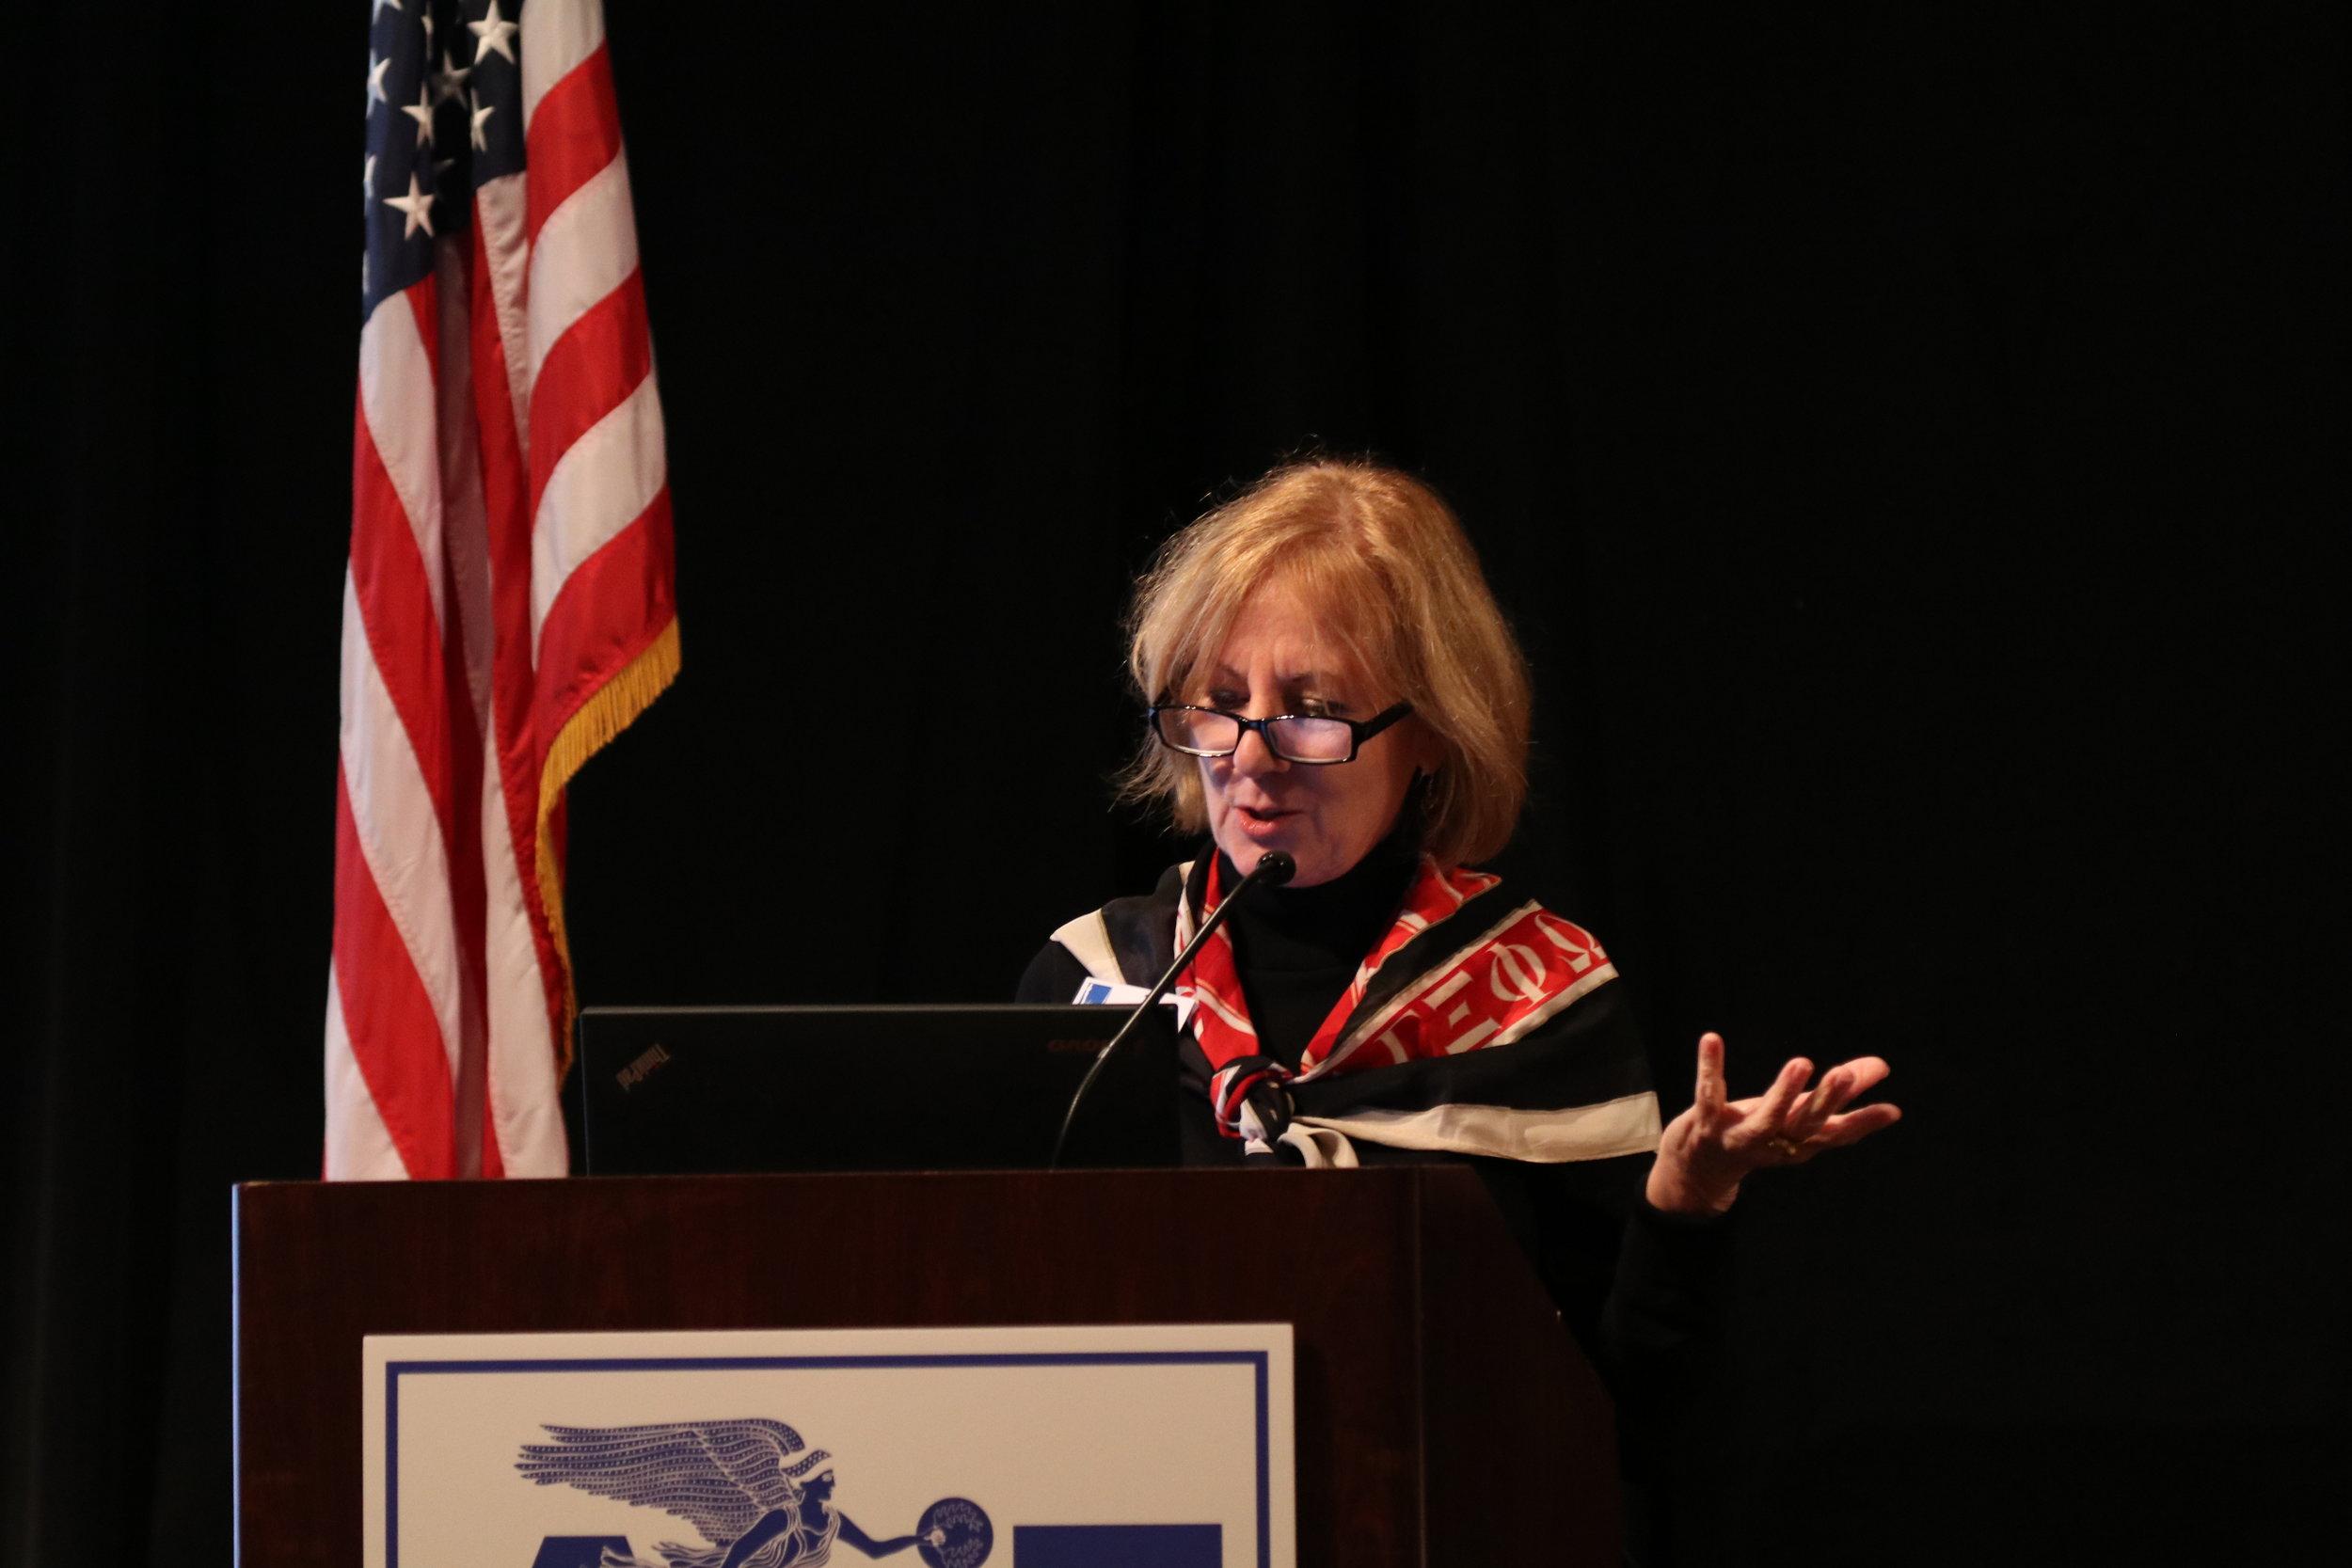 Dr. Angelyn Balodimas-Bartolomei, PDF, professor of Education, North Park University, Illinois